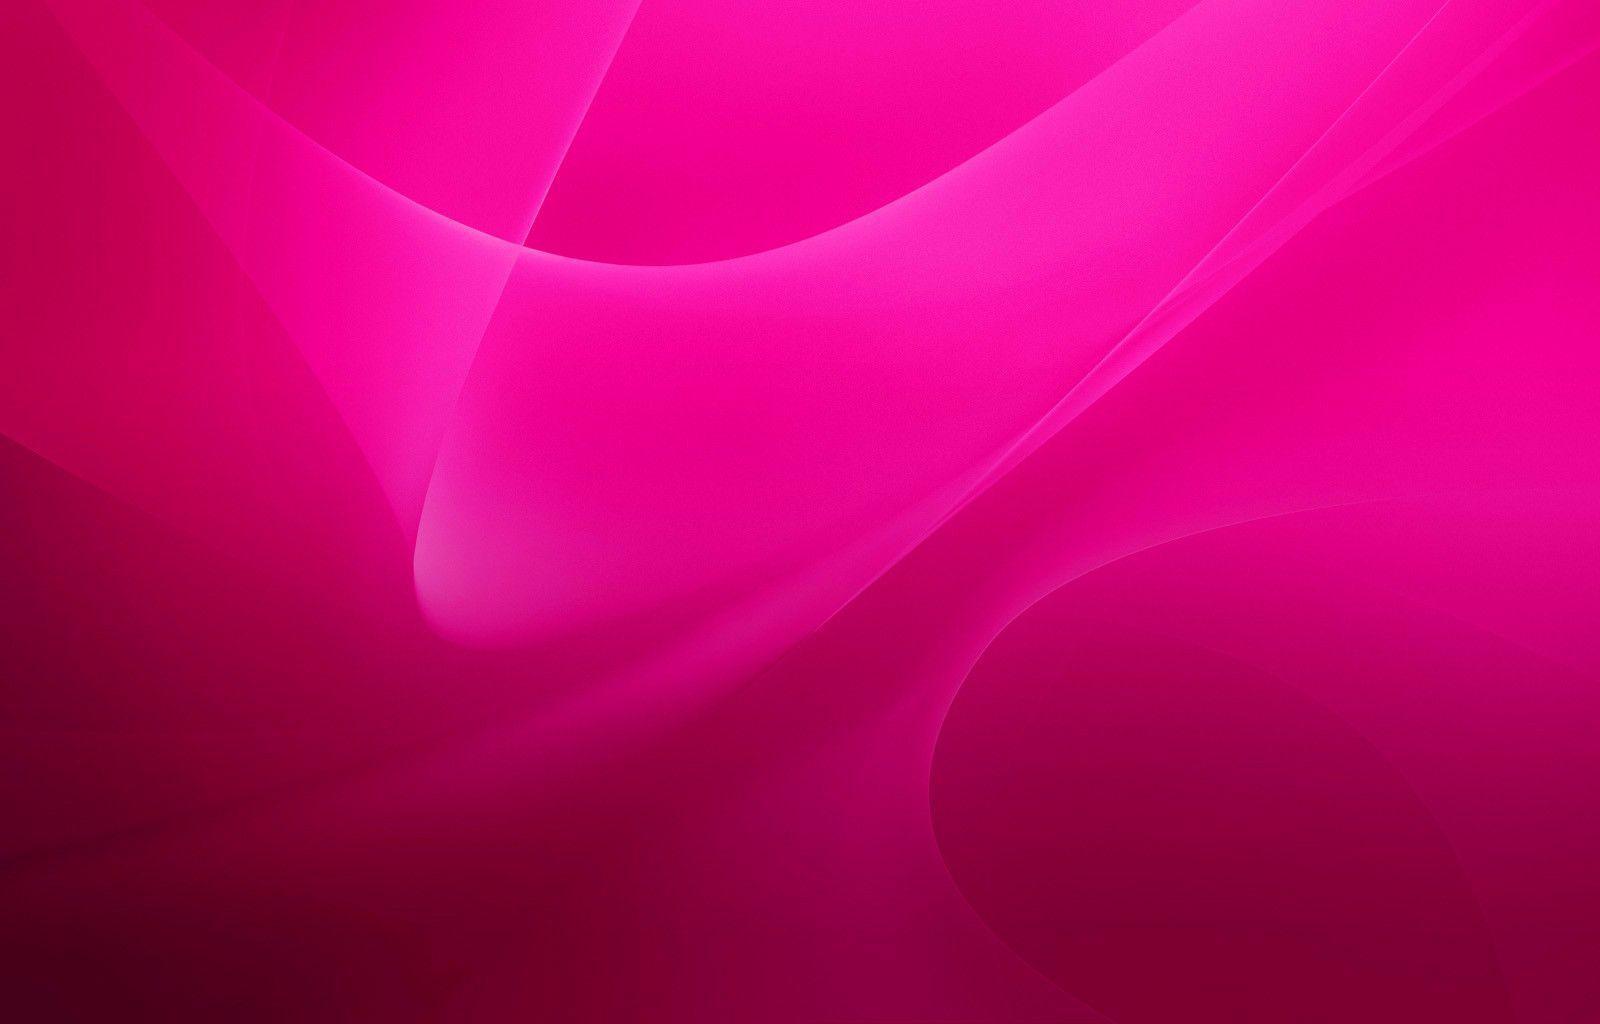 Pink HD Wallpapers - Wallpaper Cave